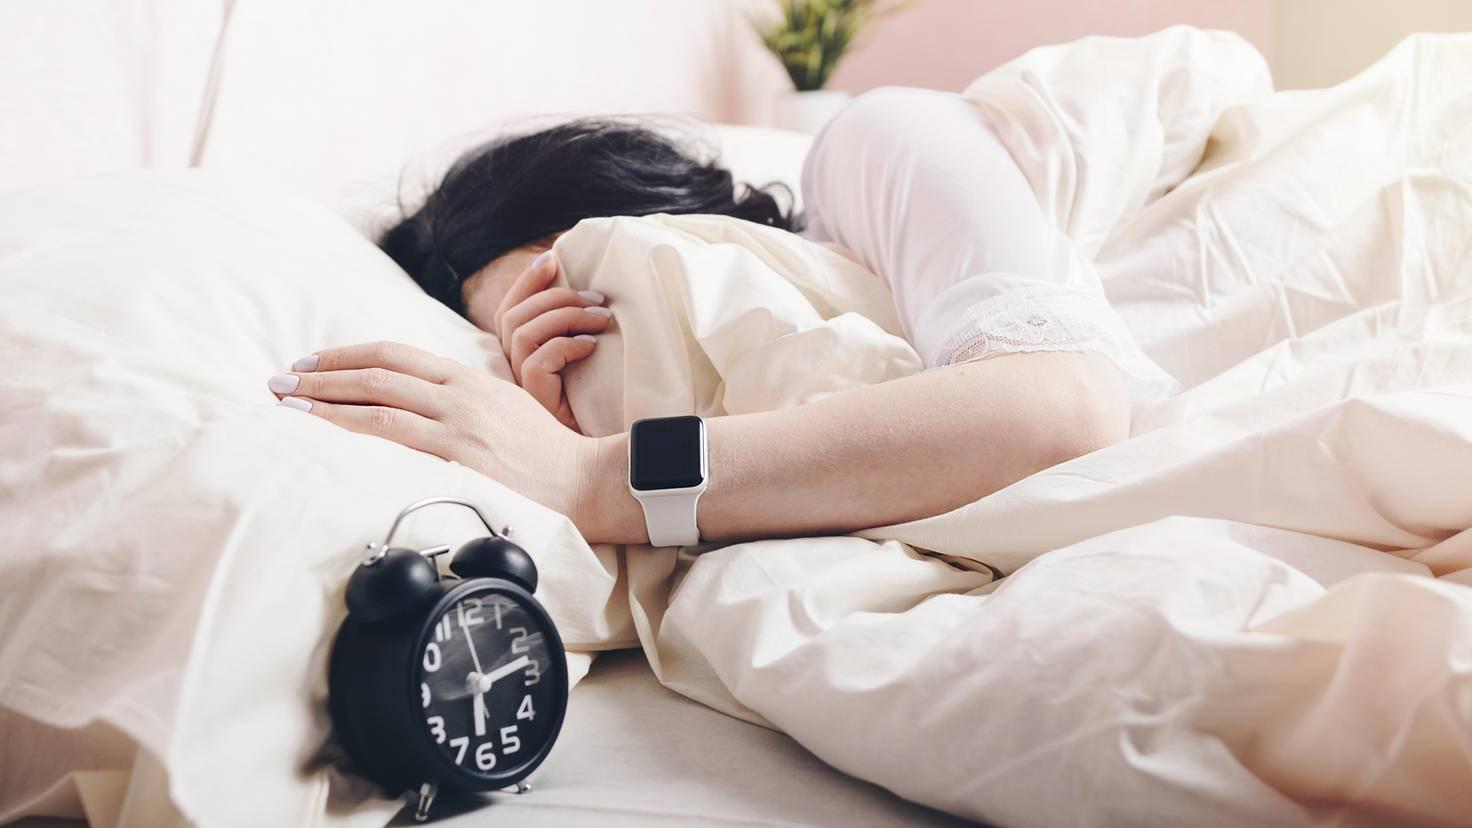 Apple Watch Sleep Apps-Samio20-AdobeStock_247885903